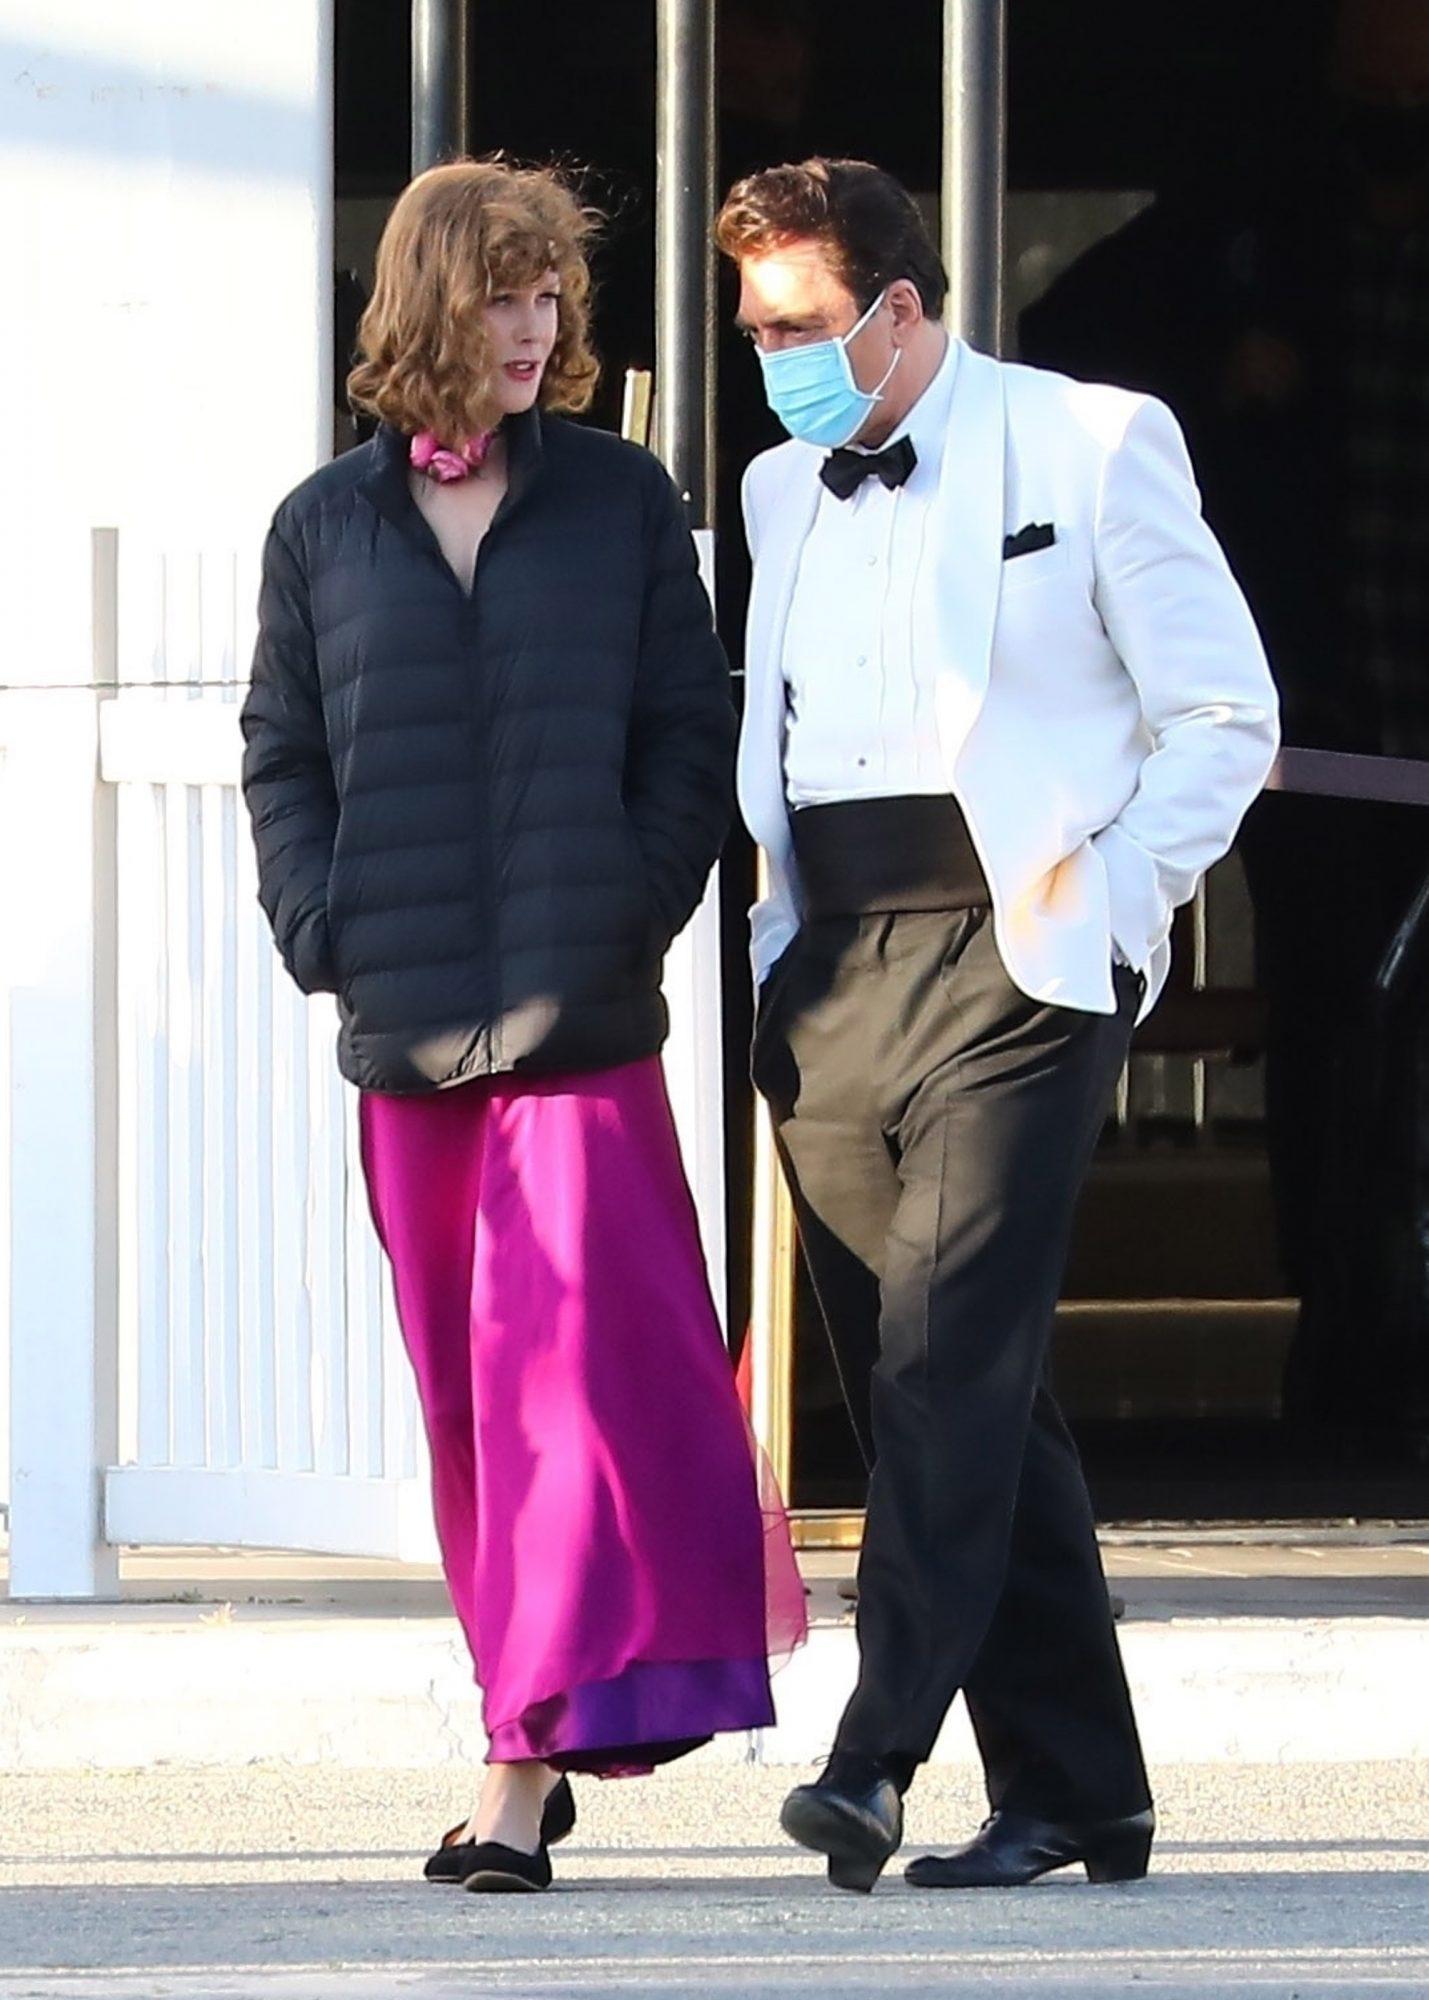 Nicole Kidman & Javier Bardem Take a Break from Filming 'Being the Ricardos